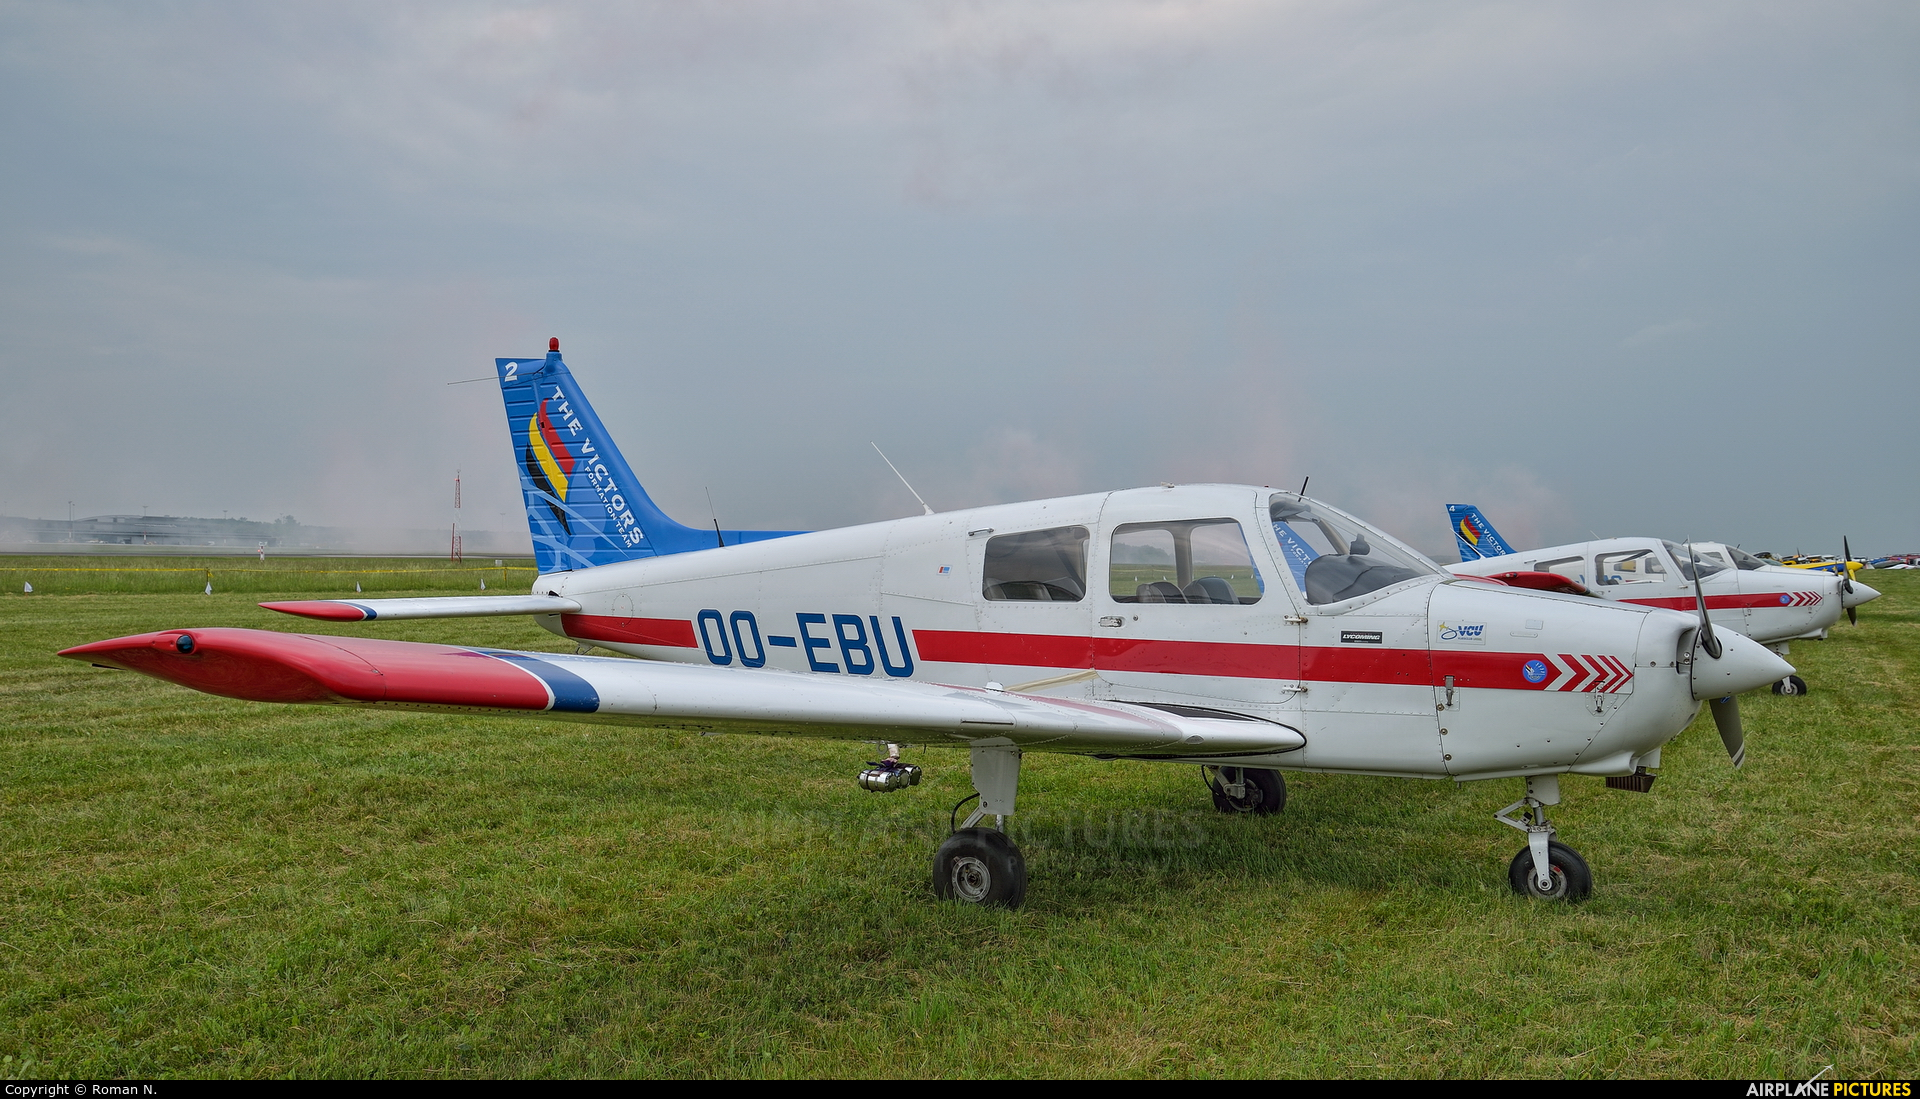 Aero Club-Ursel OO-EBU aircraft at Poznań - Ławica